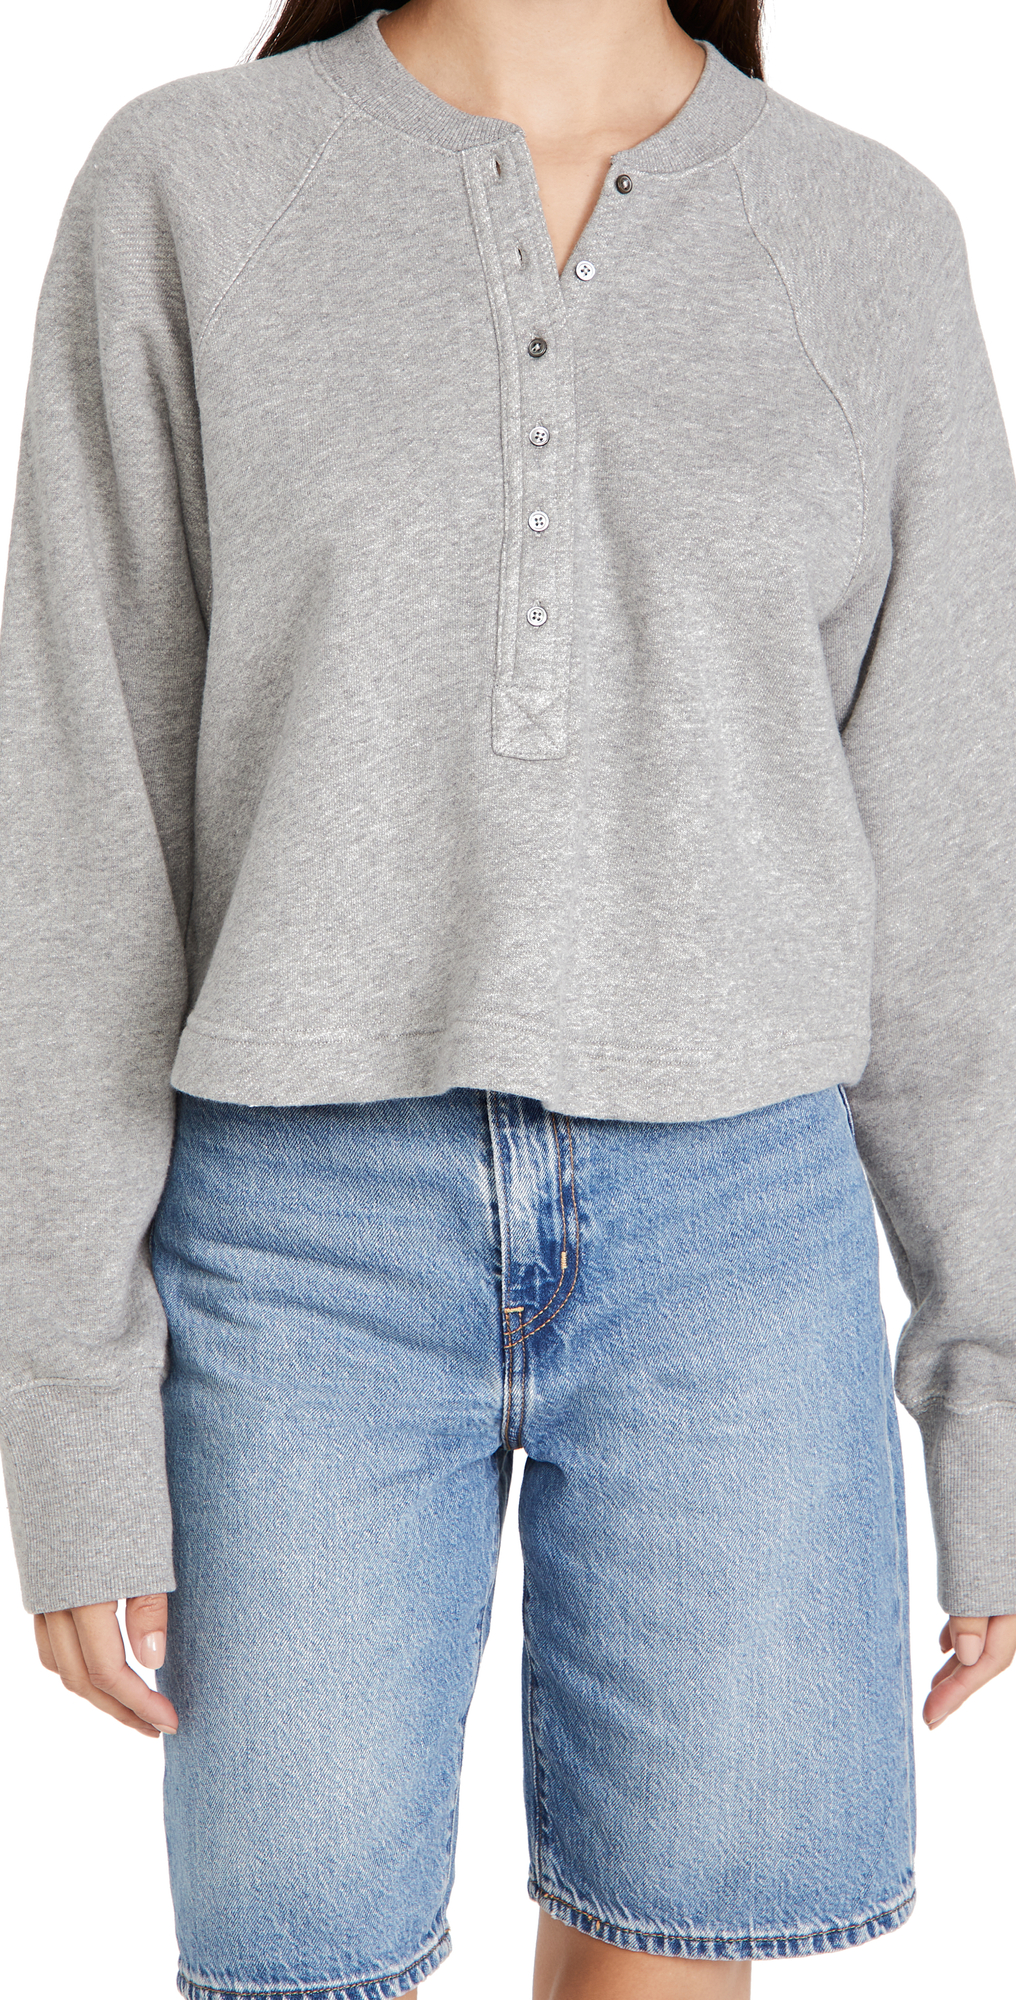 So Uptight Plunge Henley Sweatshirt